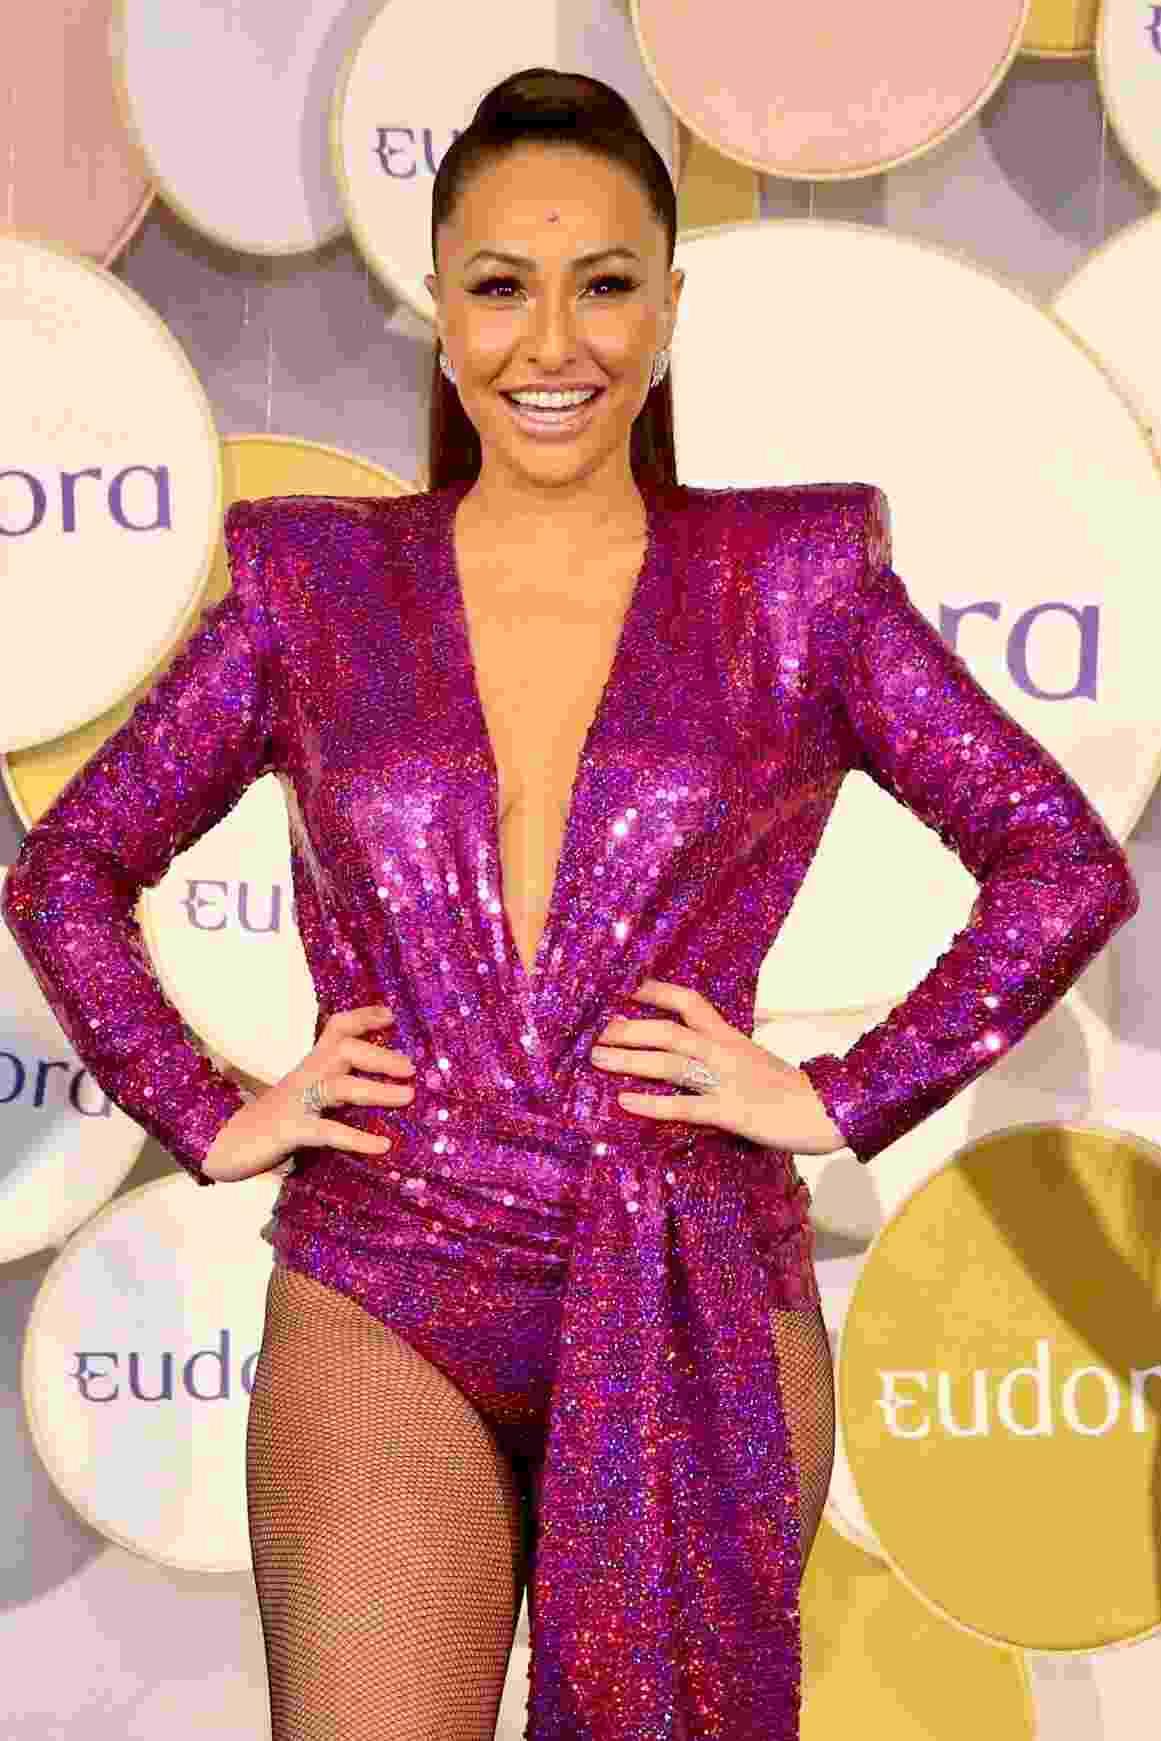 Sabrina volta ao Carnaval após gravidez - Manuela Scarpa/Brazil News